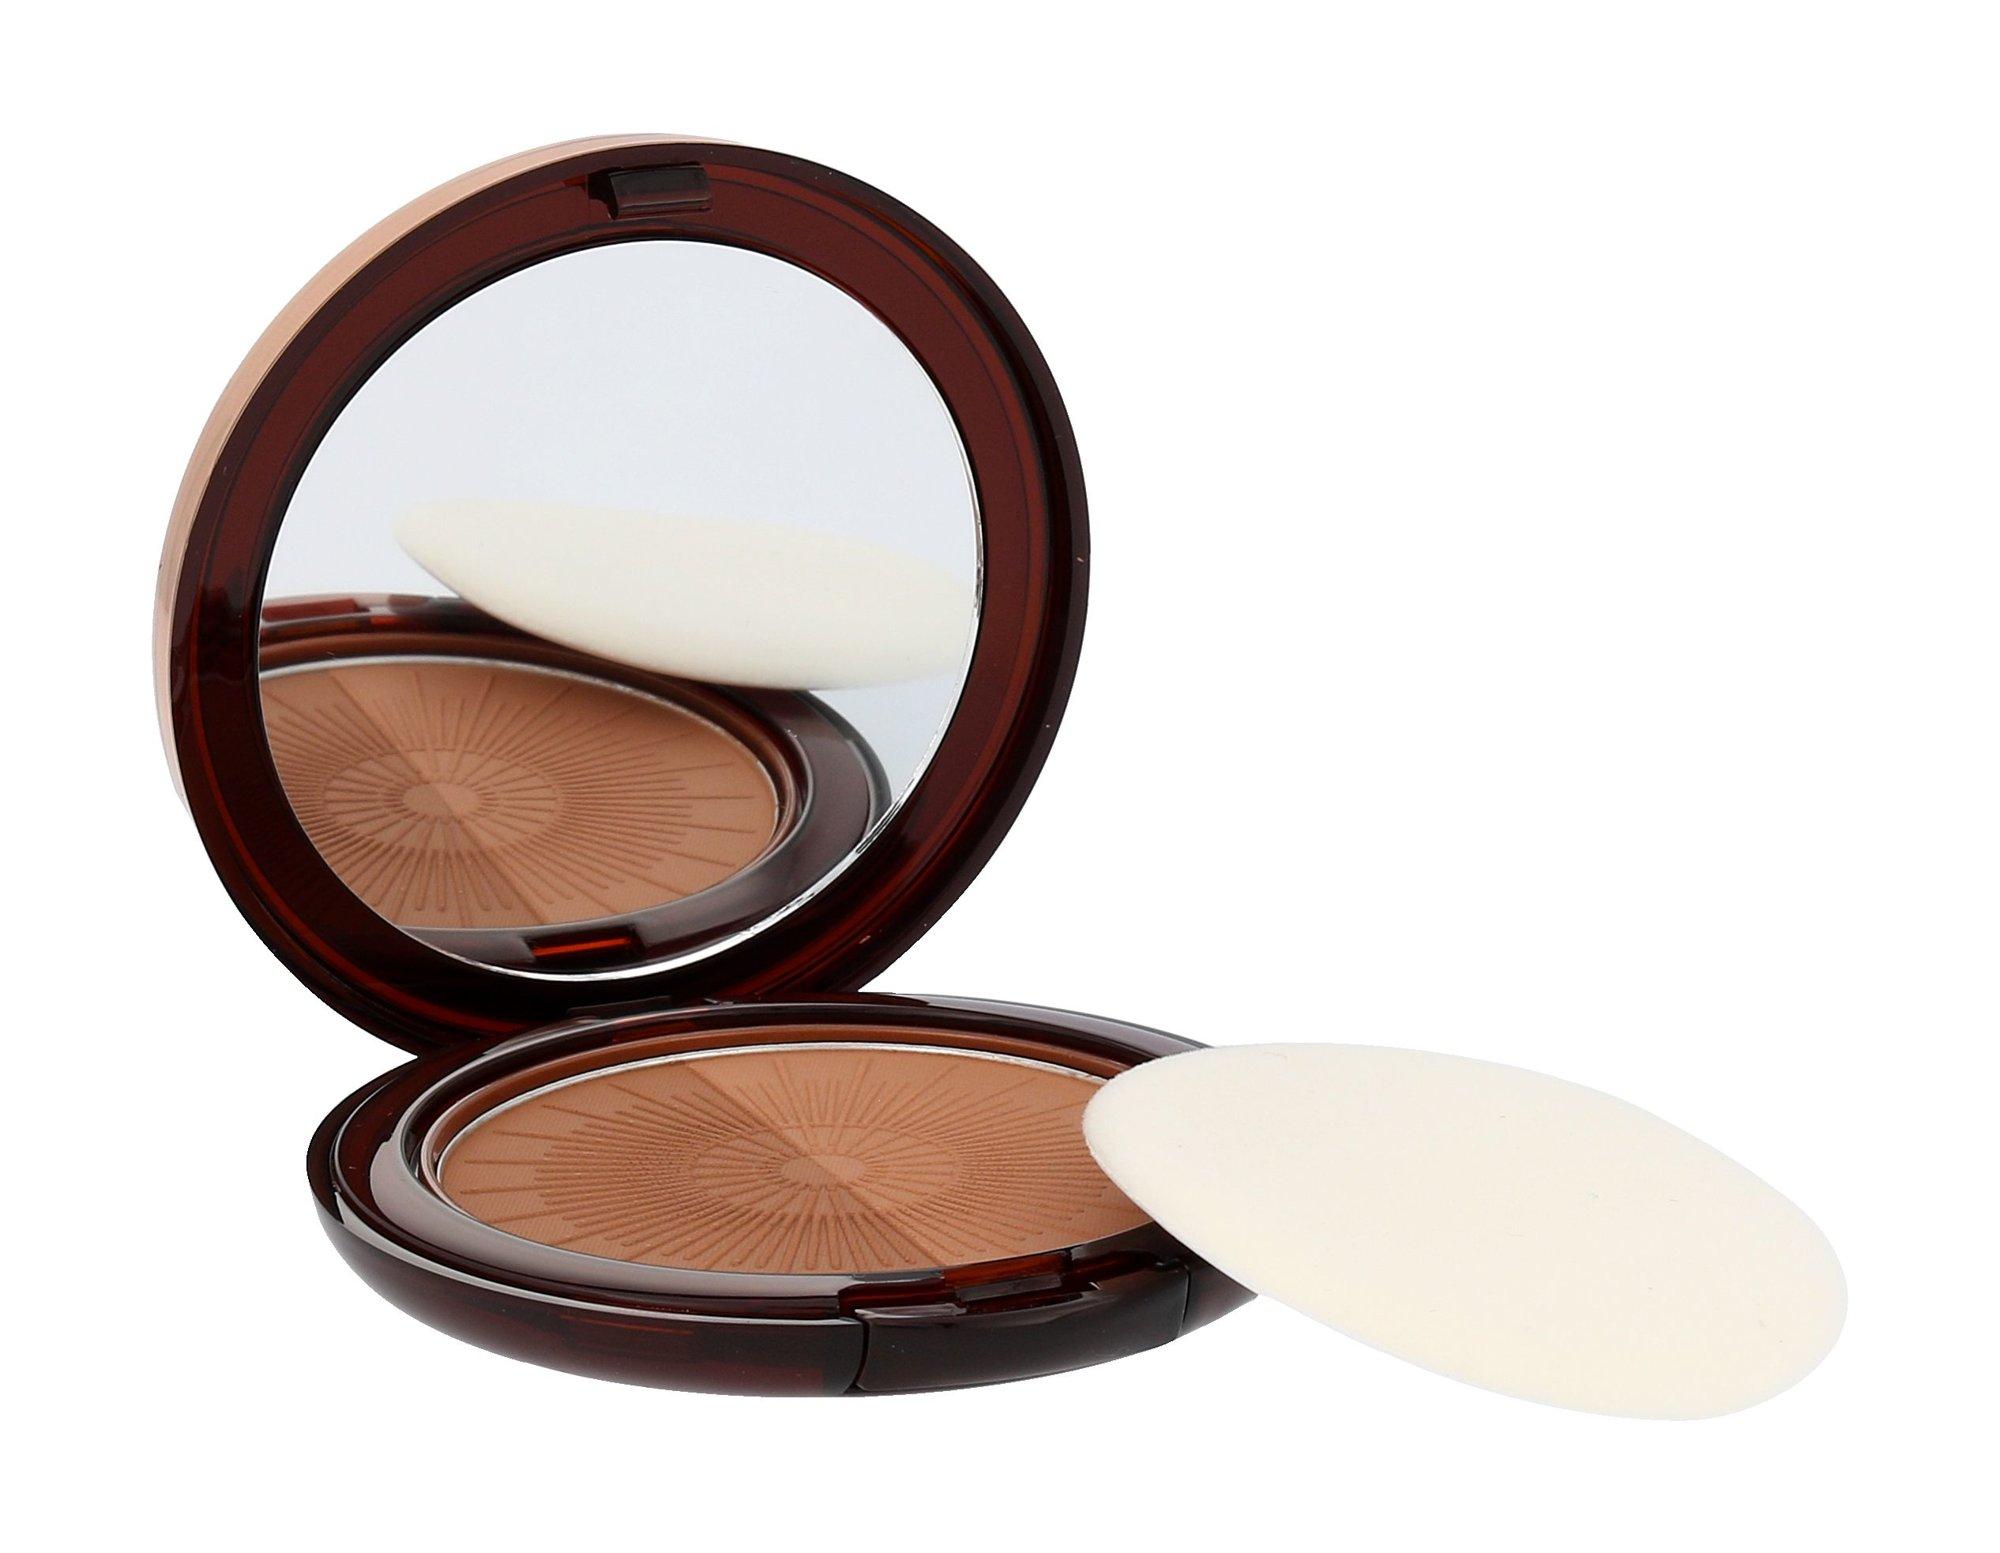 Artdeco Bronzing Powder Compact Cosmetic 10ml 30 Terracotta